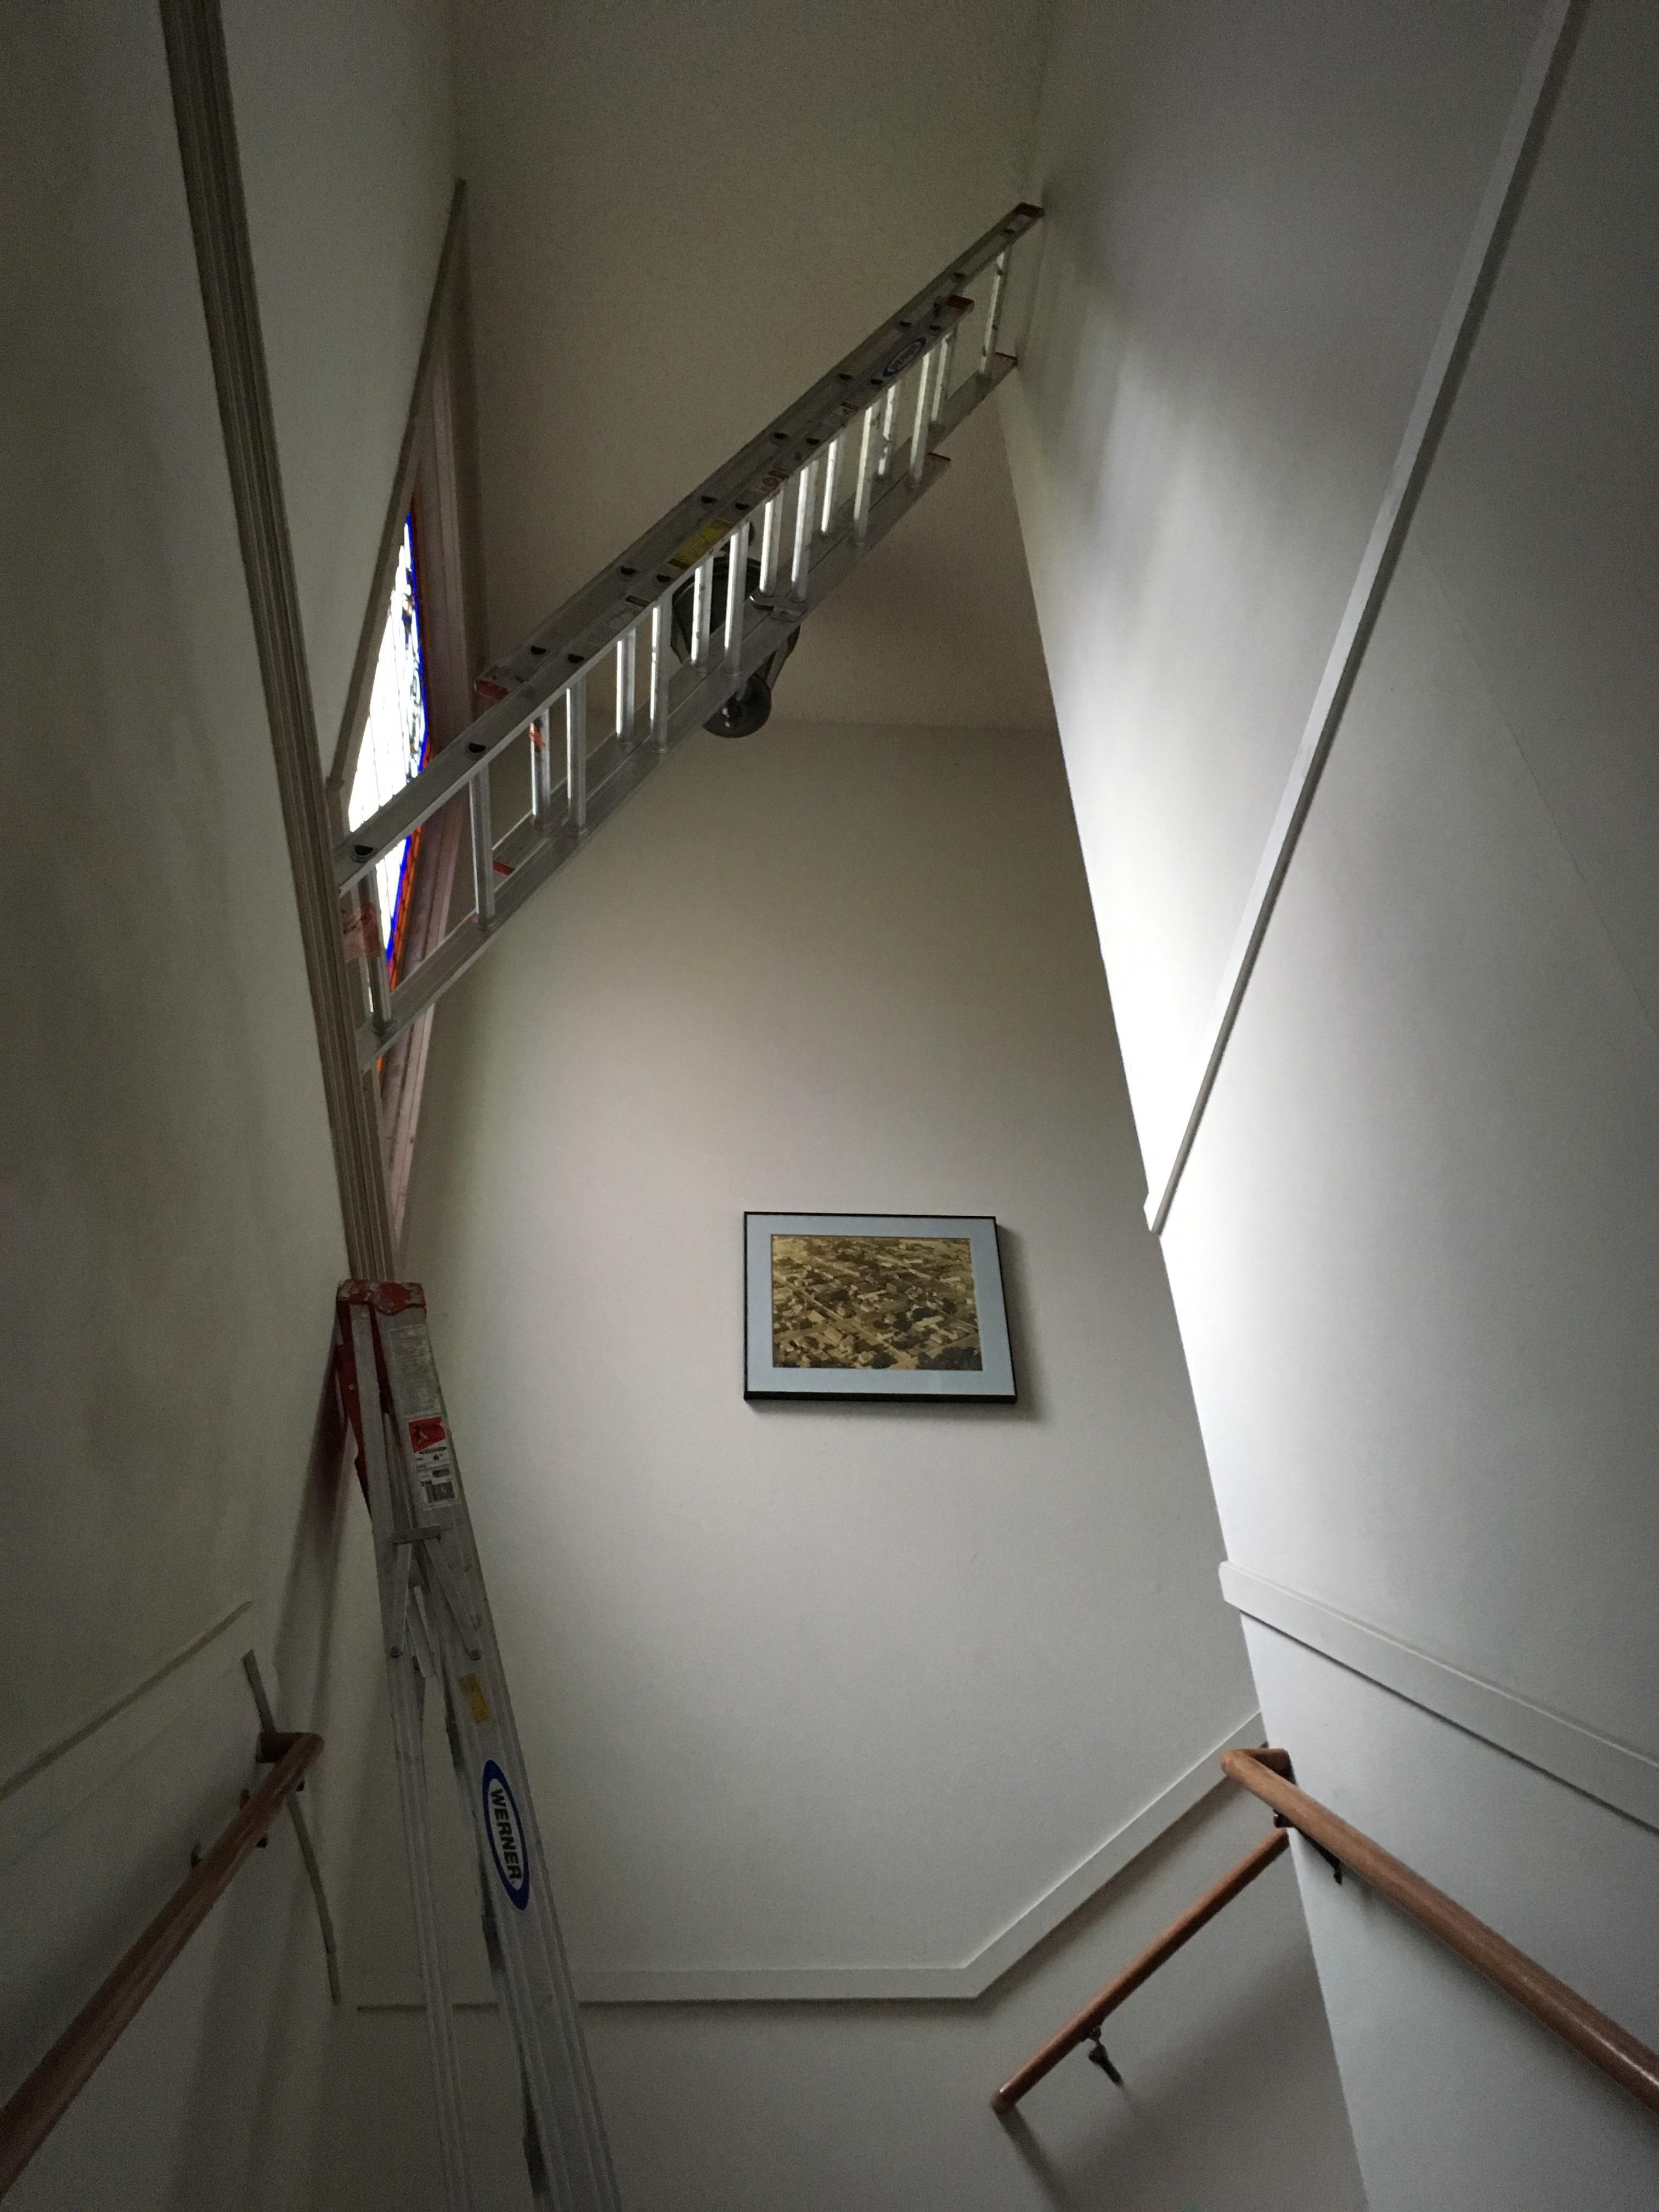 Best ideas about Reddit The Staircase . Save or Pin garrettaelito u garrettaelito Reddit Now.